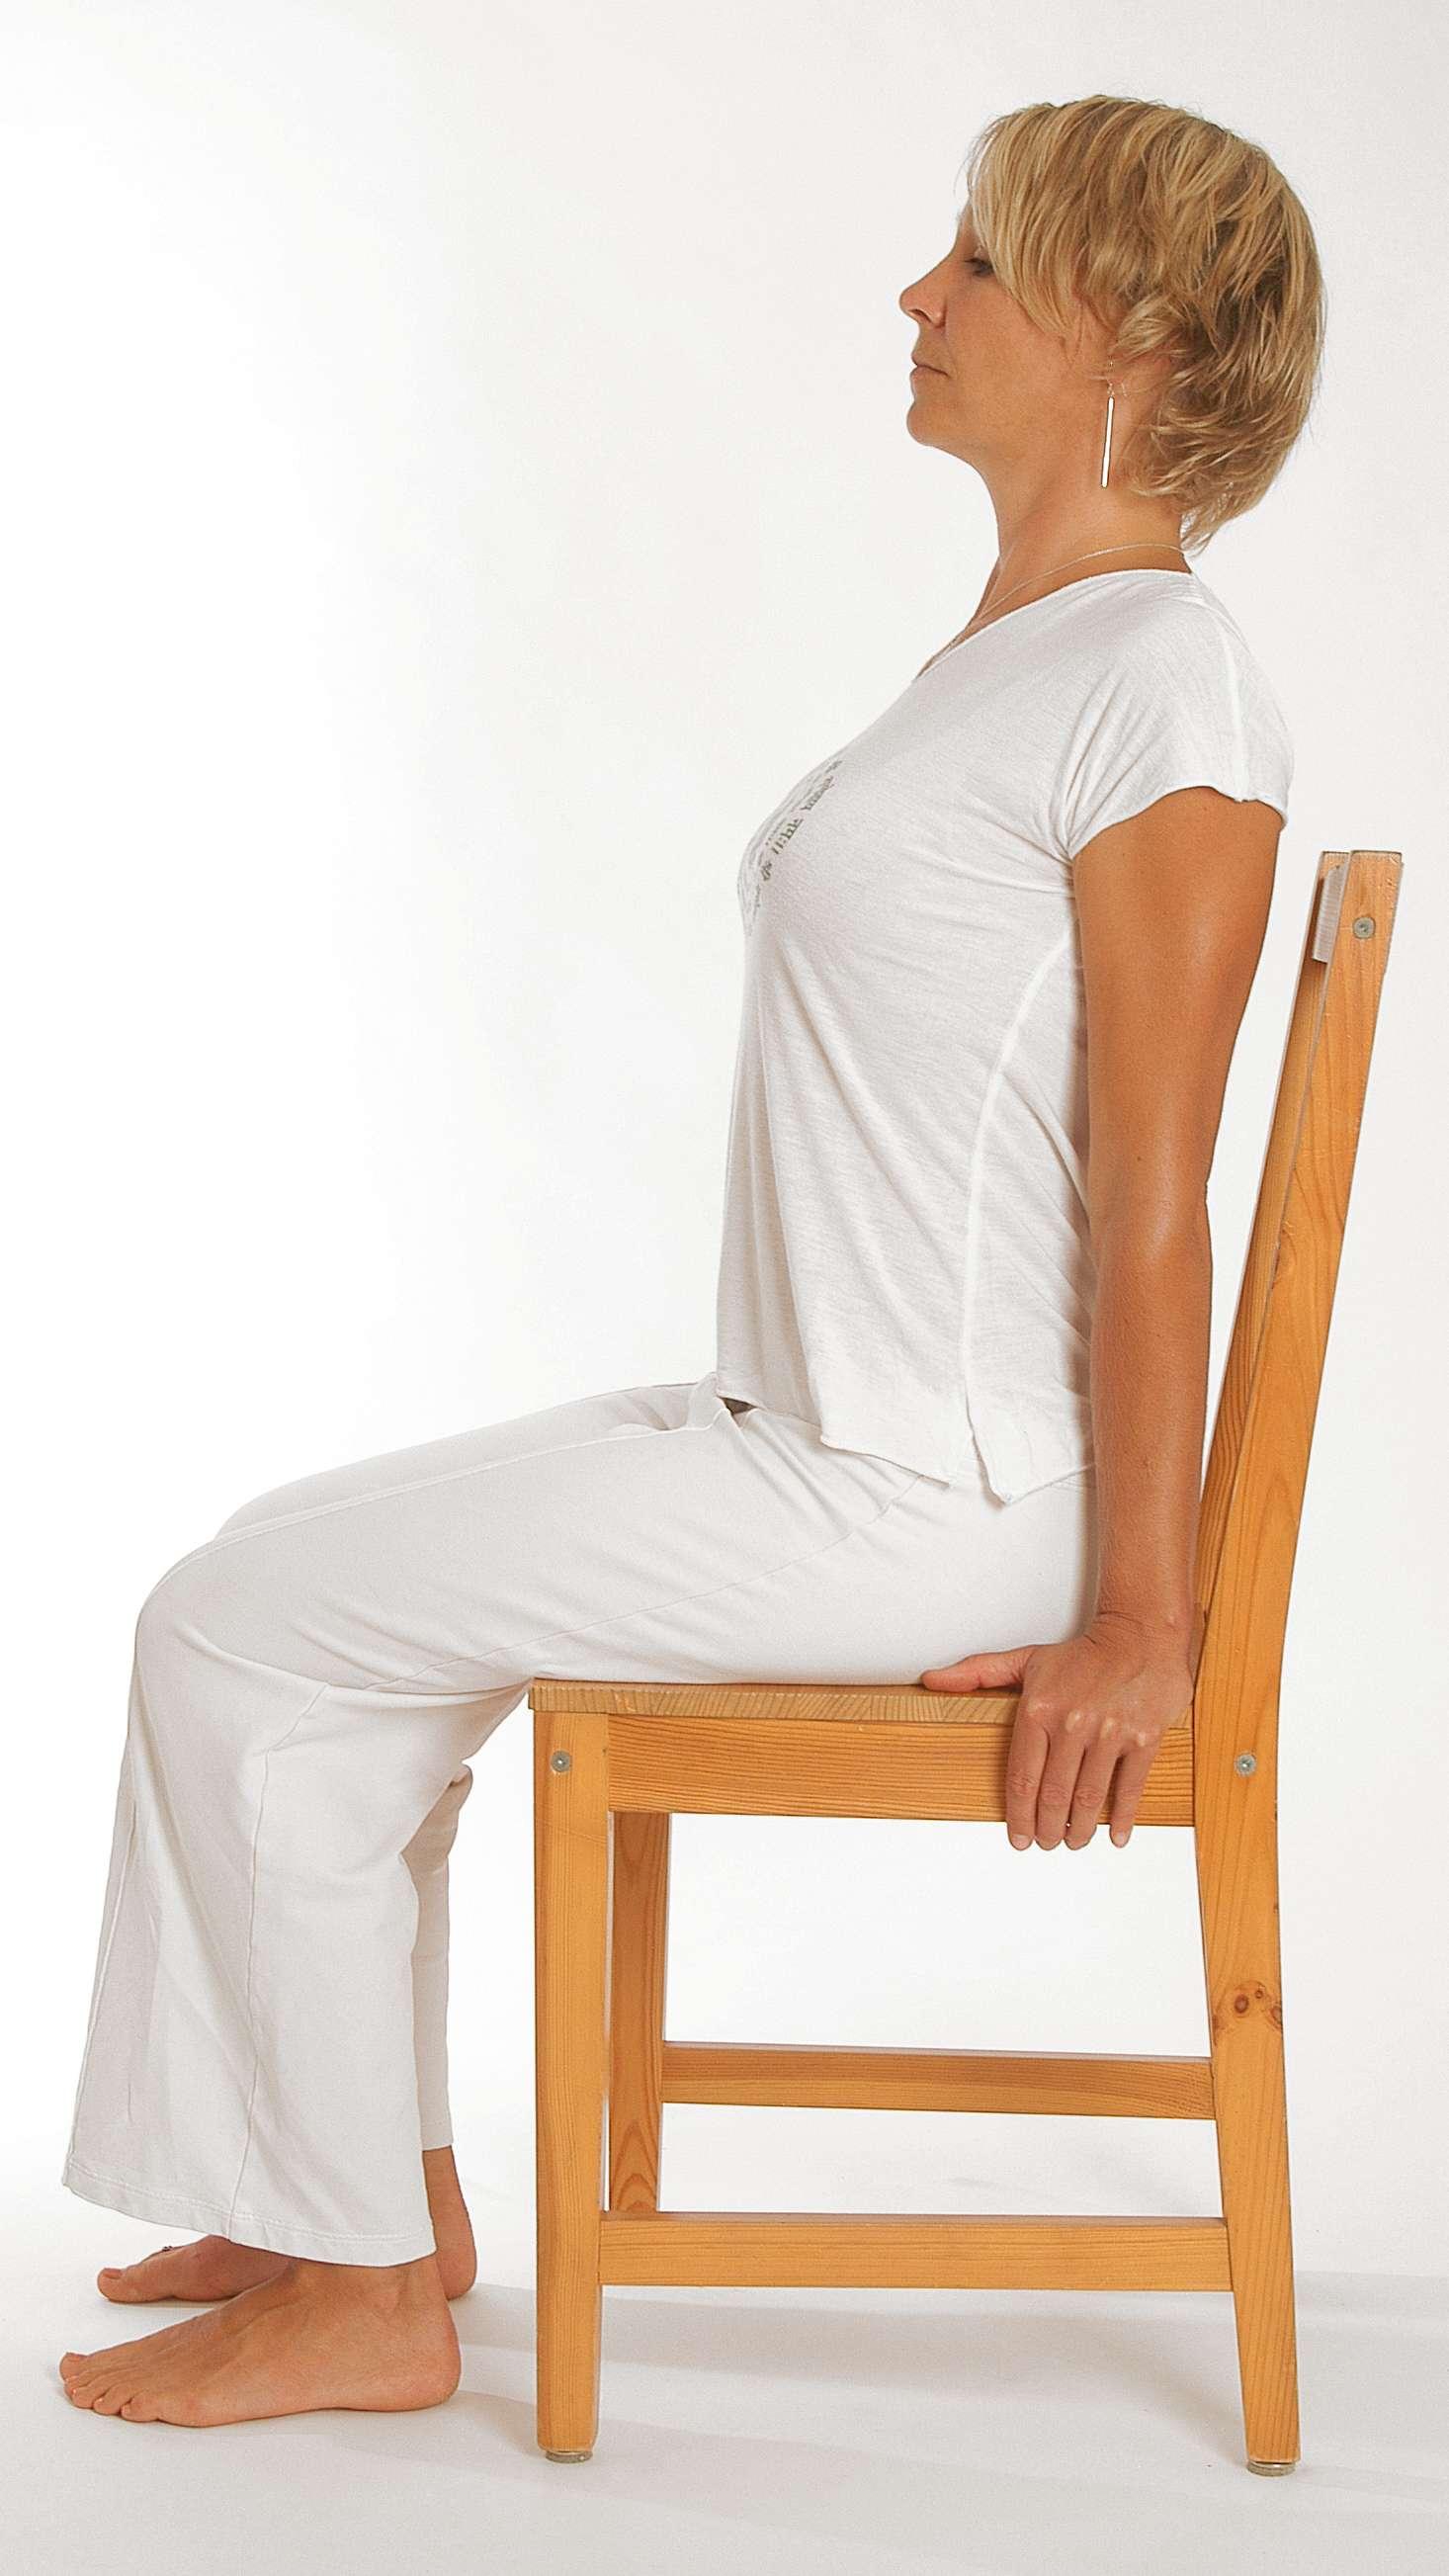 Yoga - Annabell Ditschke - Kobra auf dem Stuhl ...